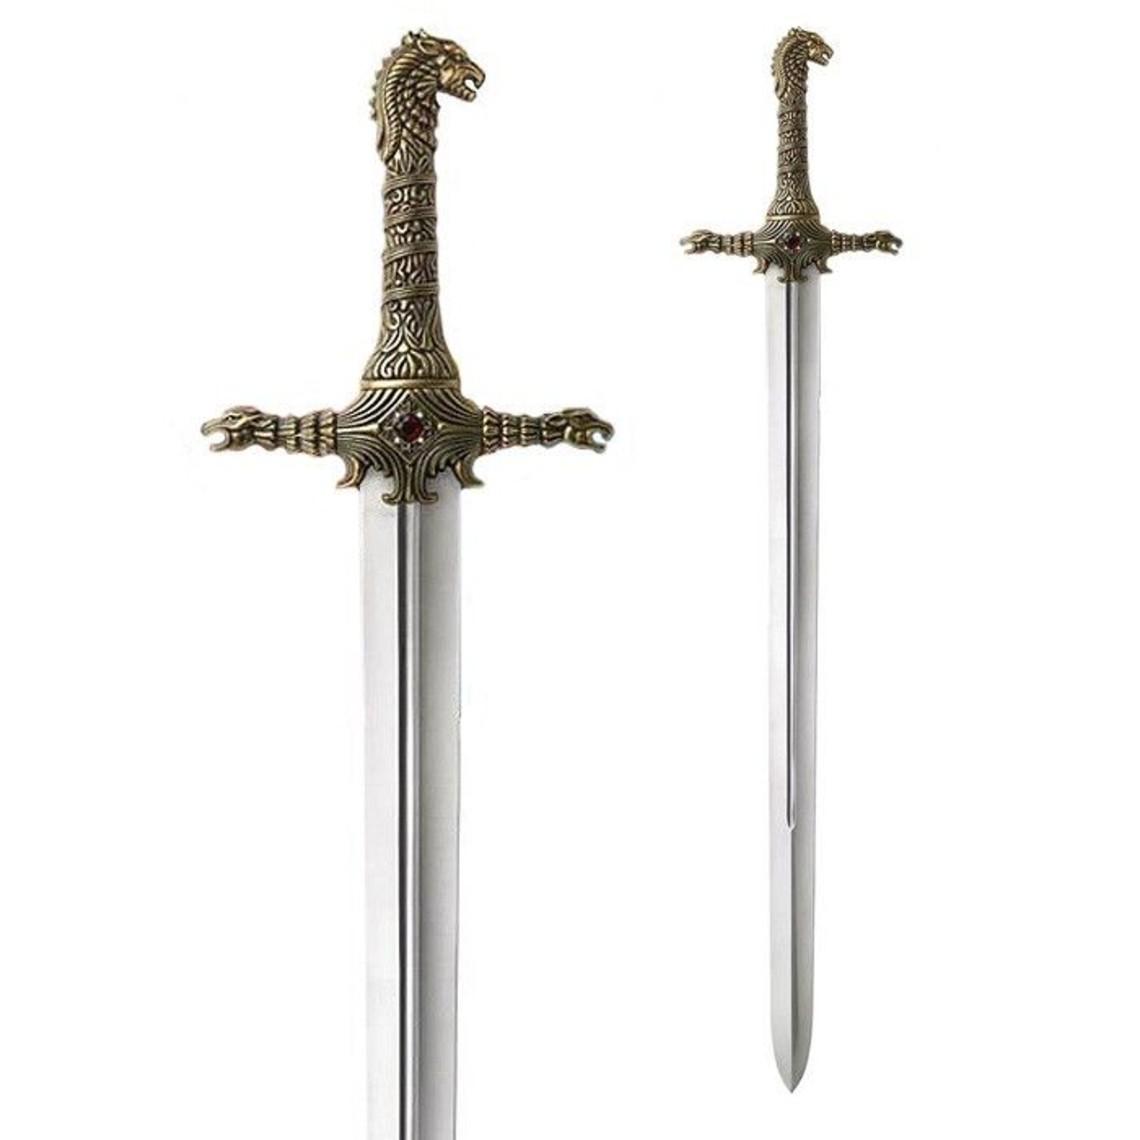 United Cutlery Game of Thrones spada Oathkeeper